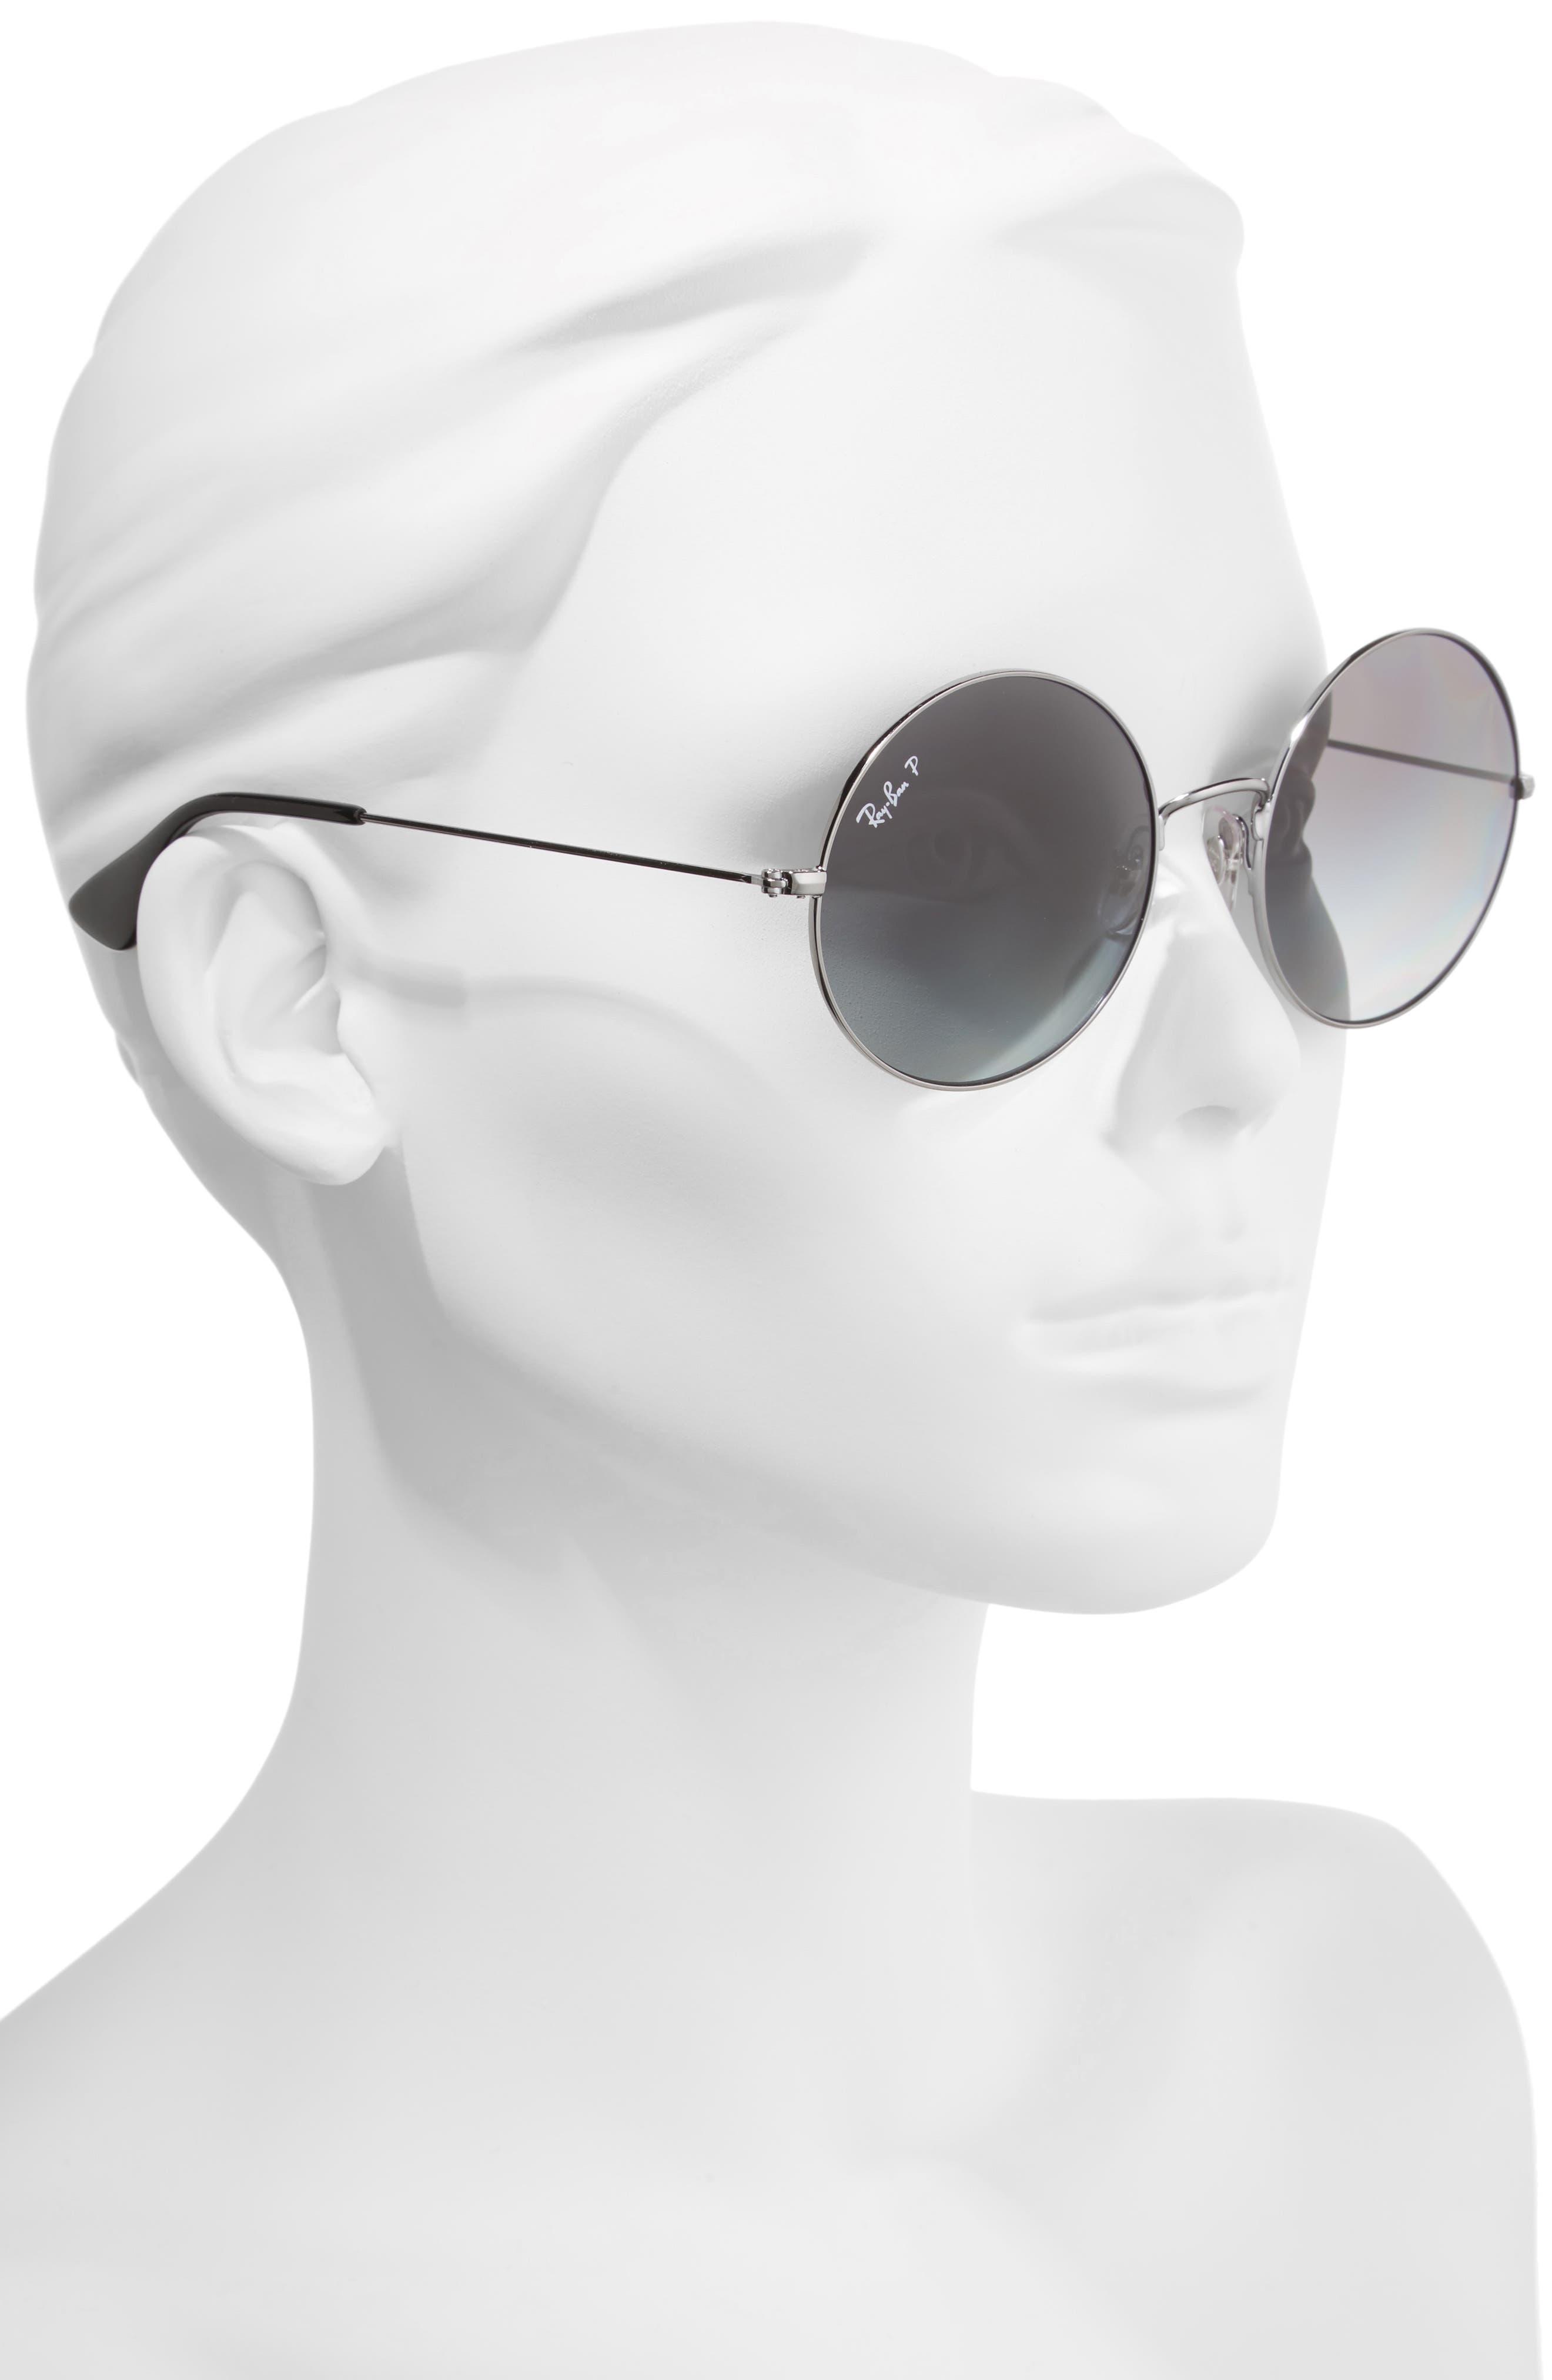 55mm Polarized Round Sunglasses,                             Alternate thumbnail 2, color,                             020